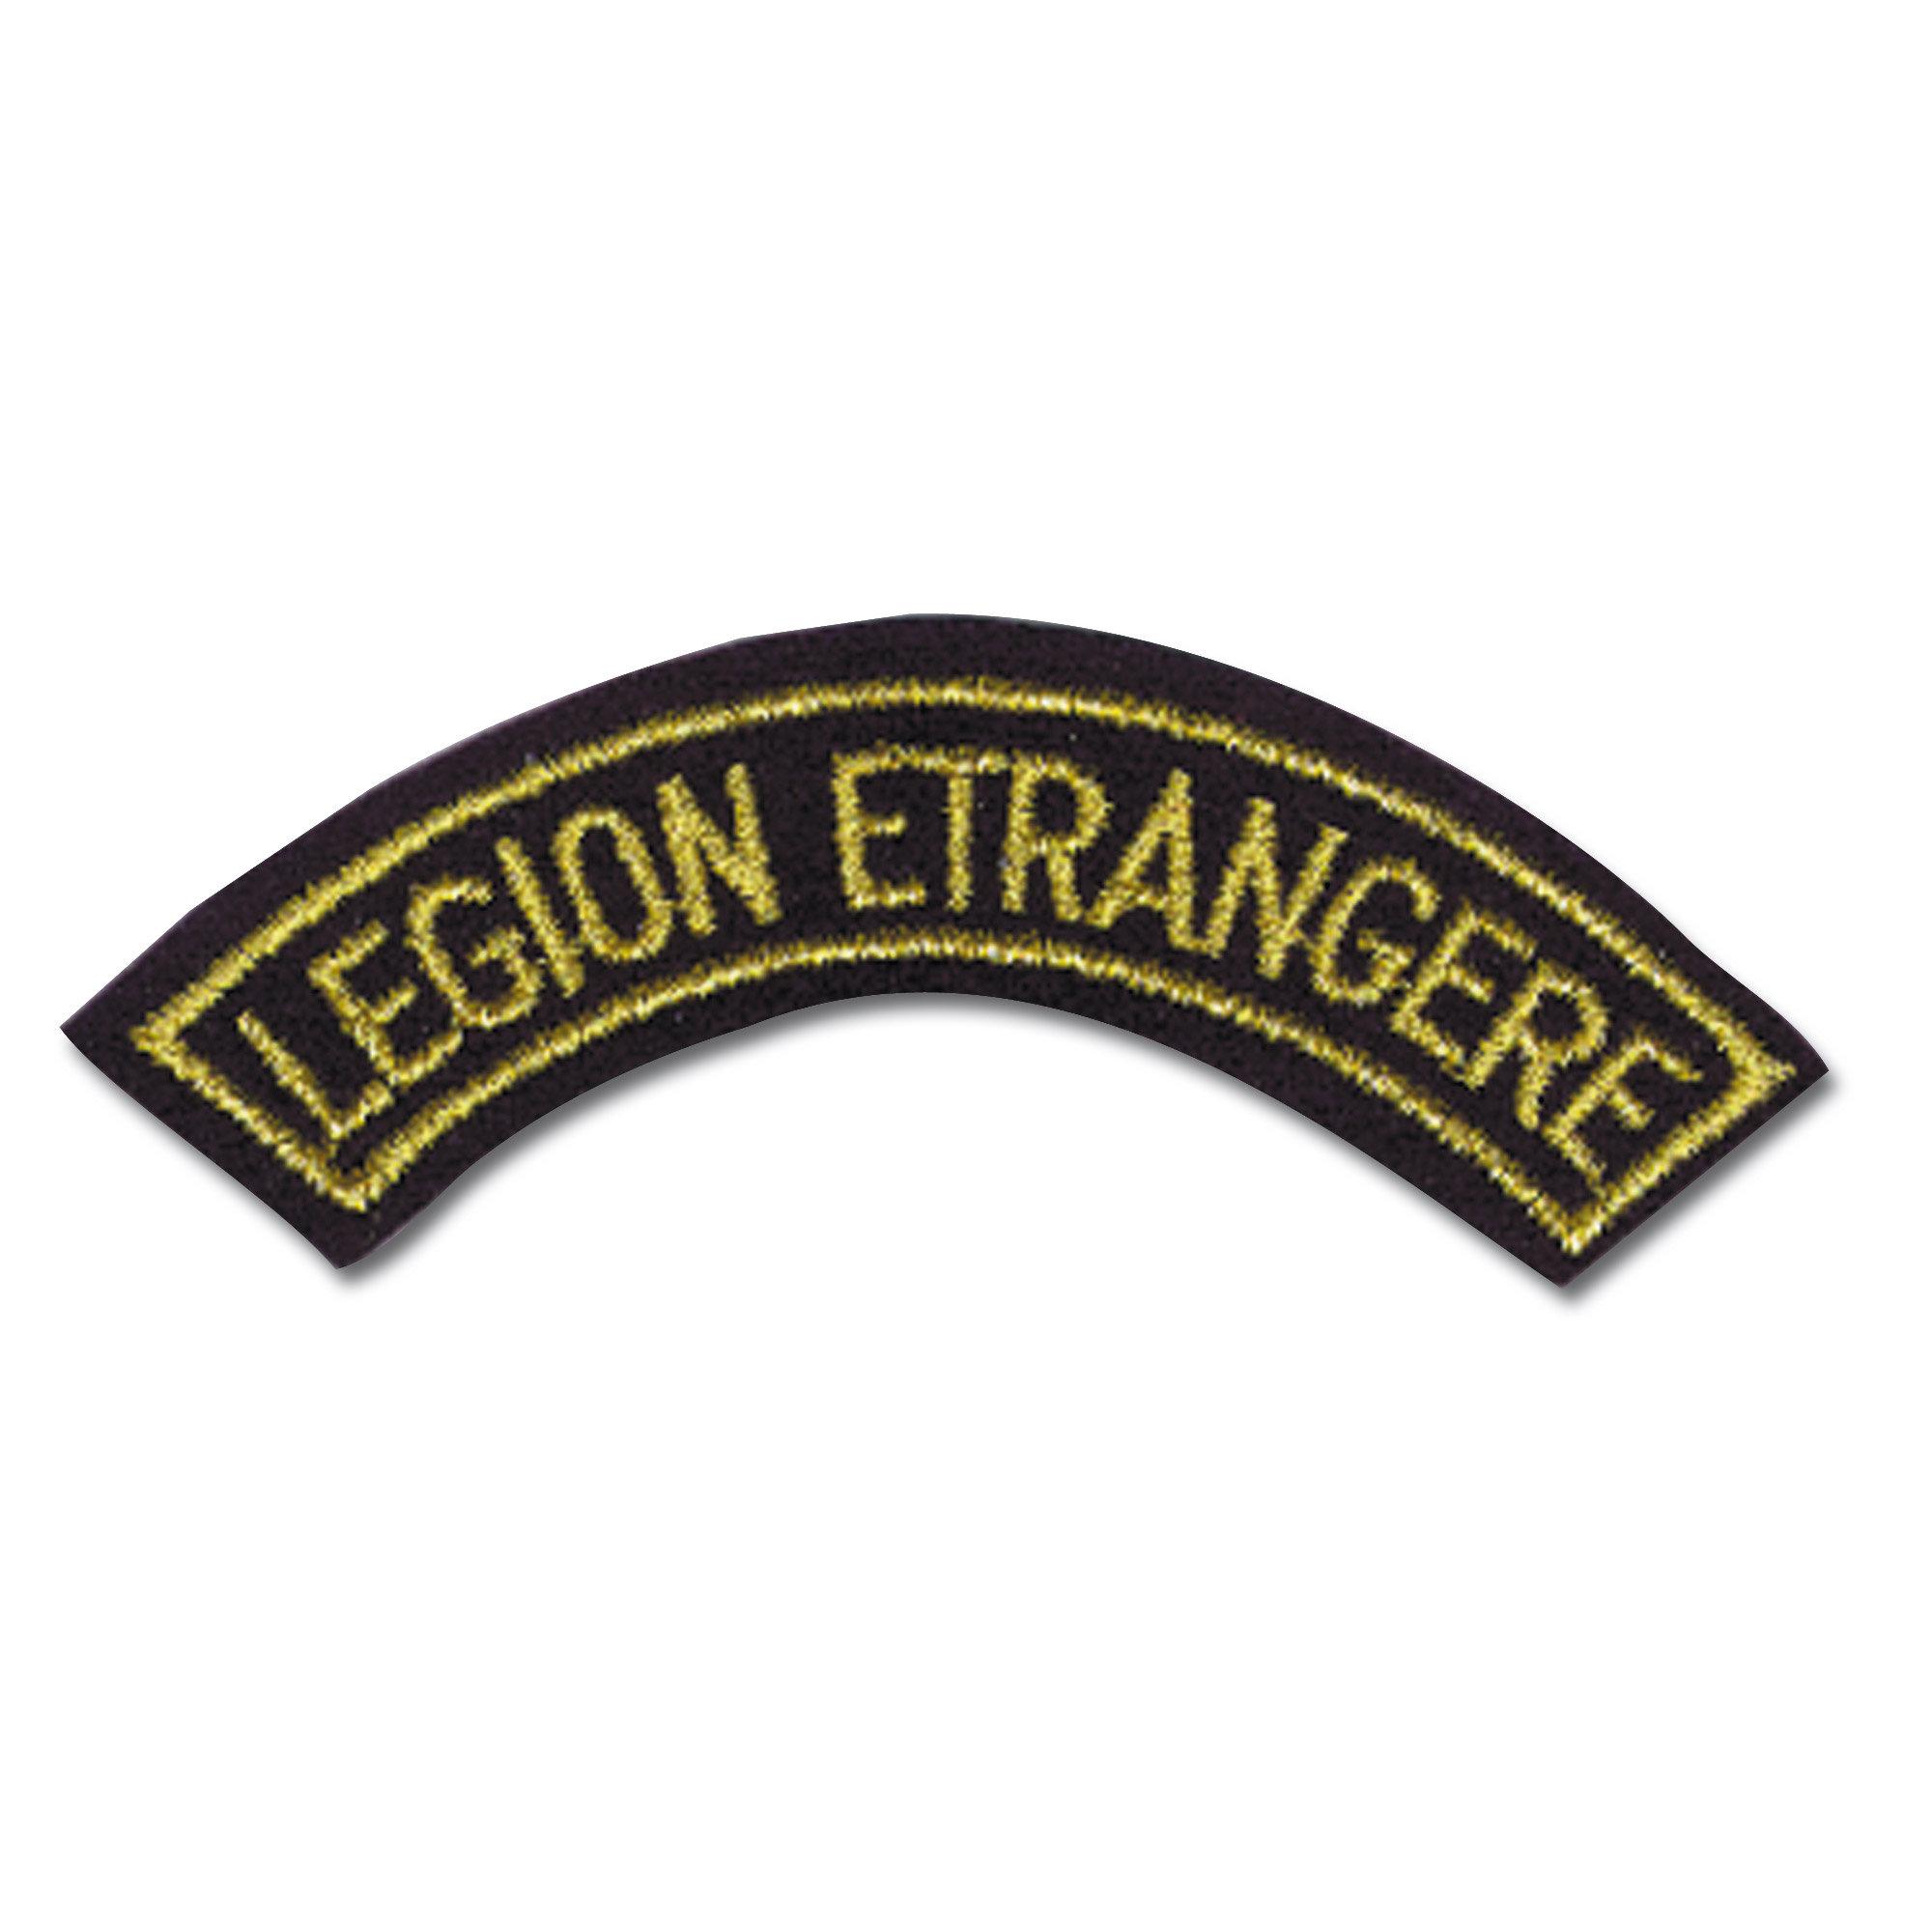 French Tab Textile Legion Etrangere